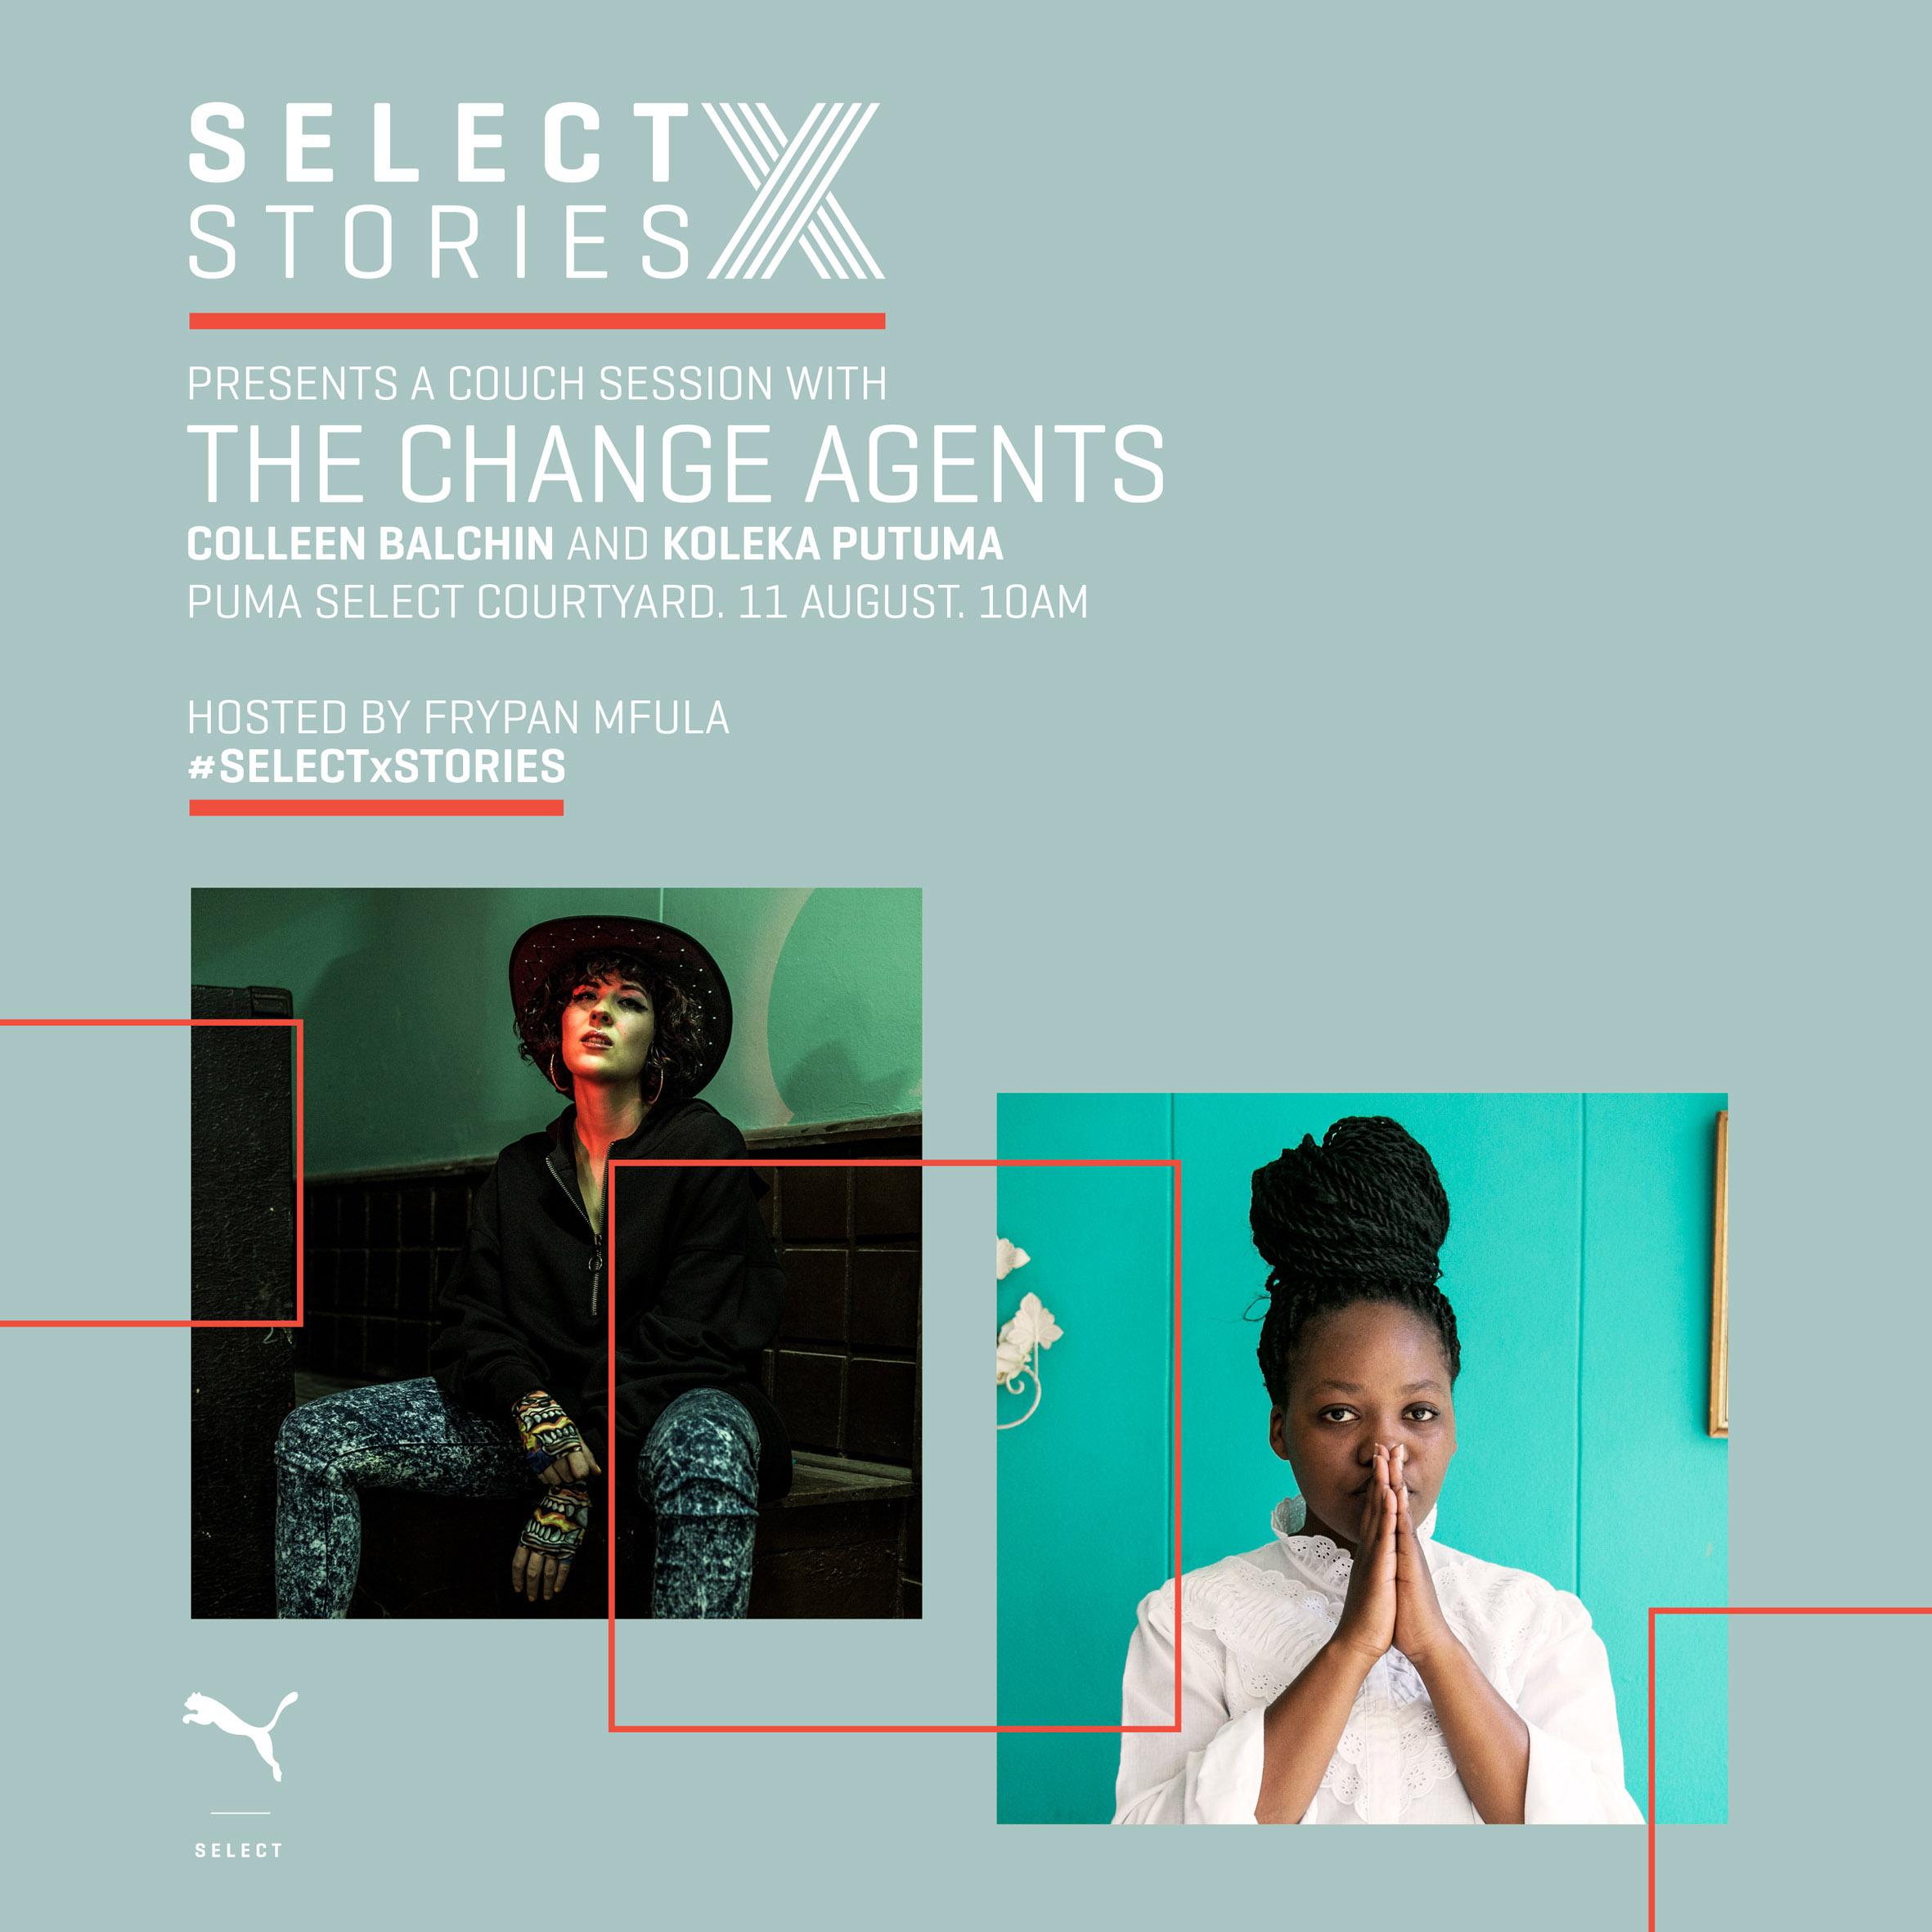 """Change Agents"" Colleen Balchin & Koleka Putuma for latest PUMA SELECT x STORIES on 11th August"